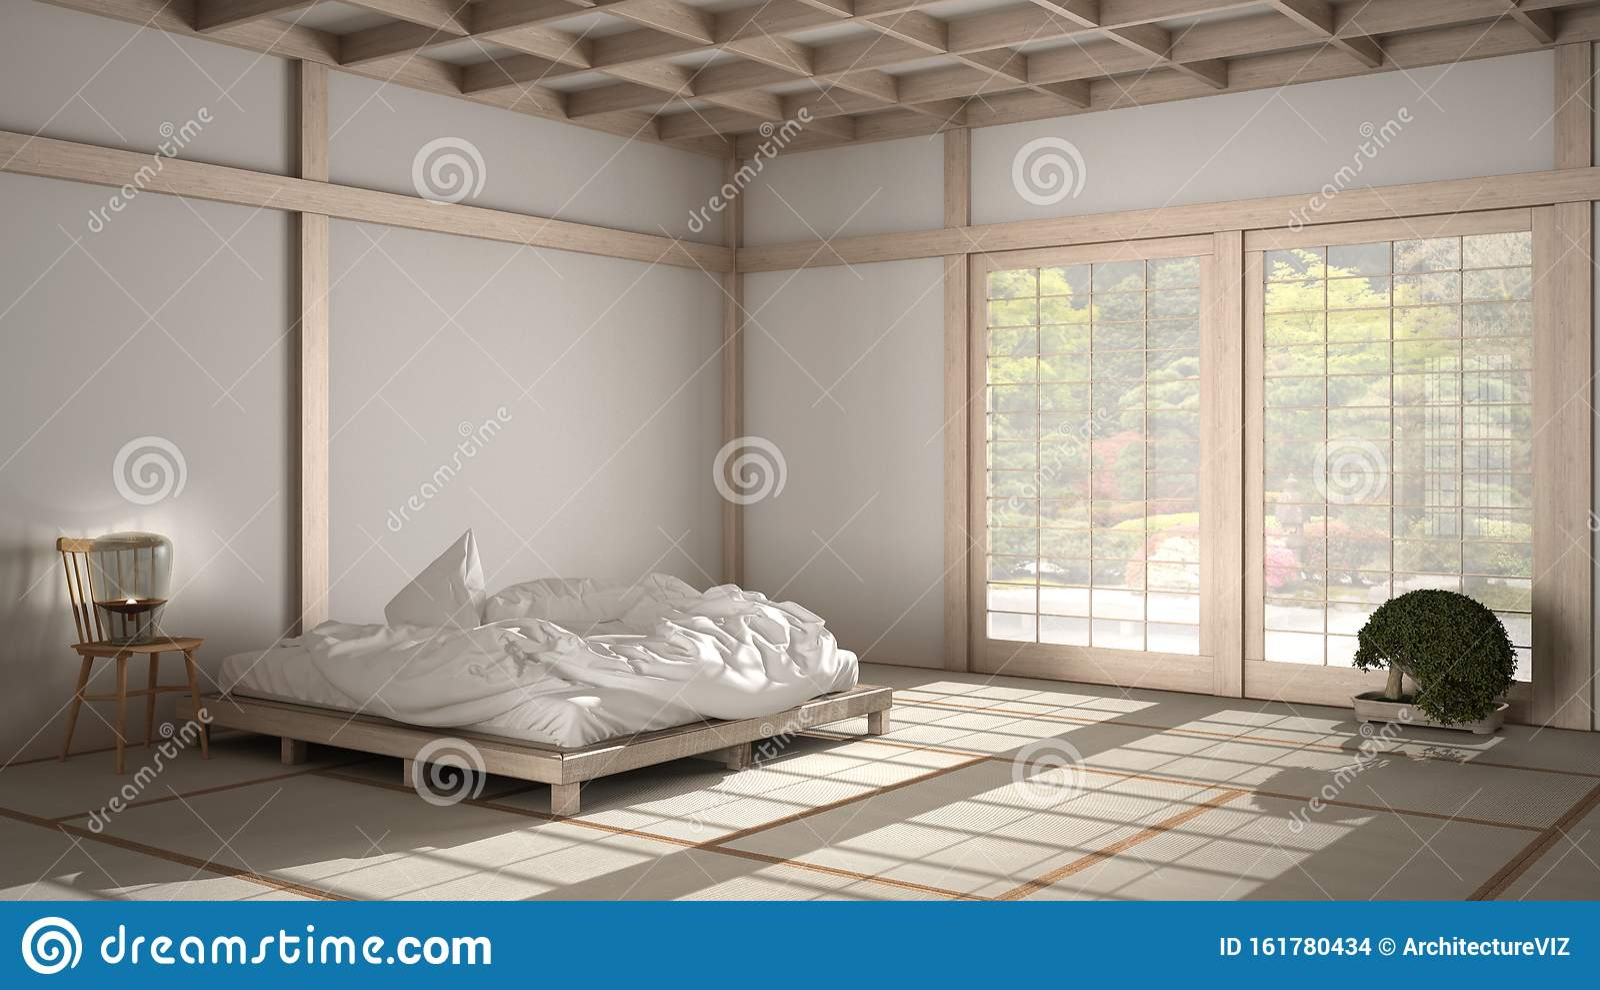 Zen Japanese Empty Minimalist Bedroom Wooden Roof Tatami Floor Futon Double Bed Big Window On Zen Garden Meditative Space Stock Illustration Illustration Of Calm Furniture 161780434